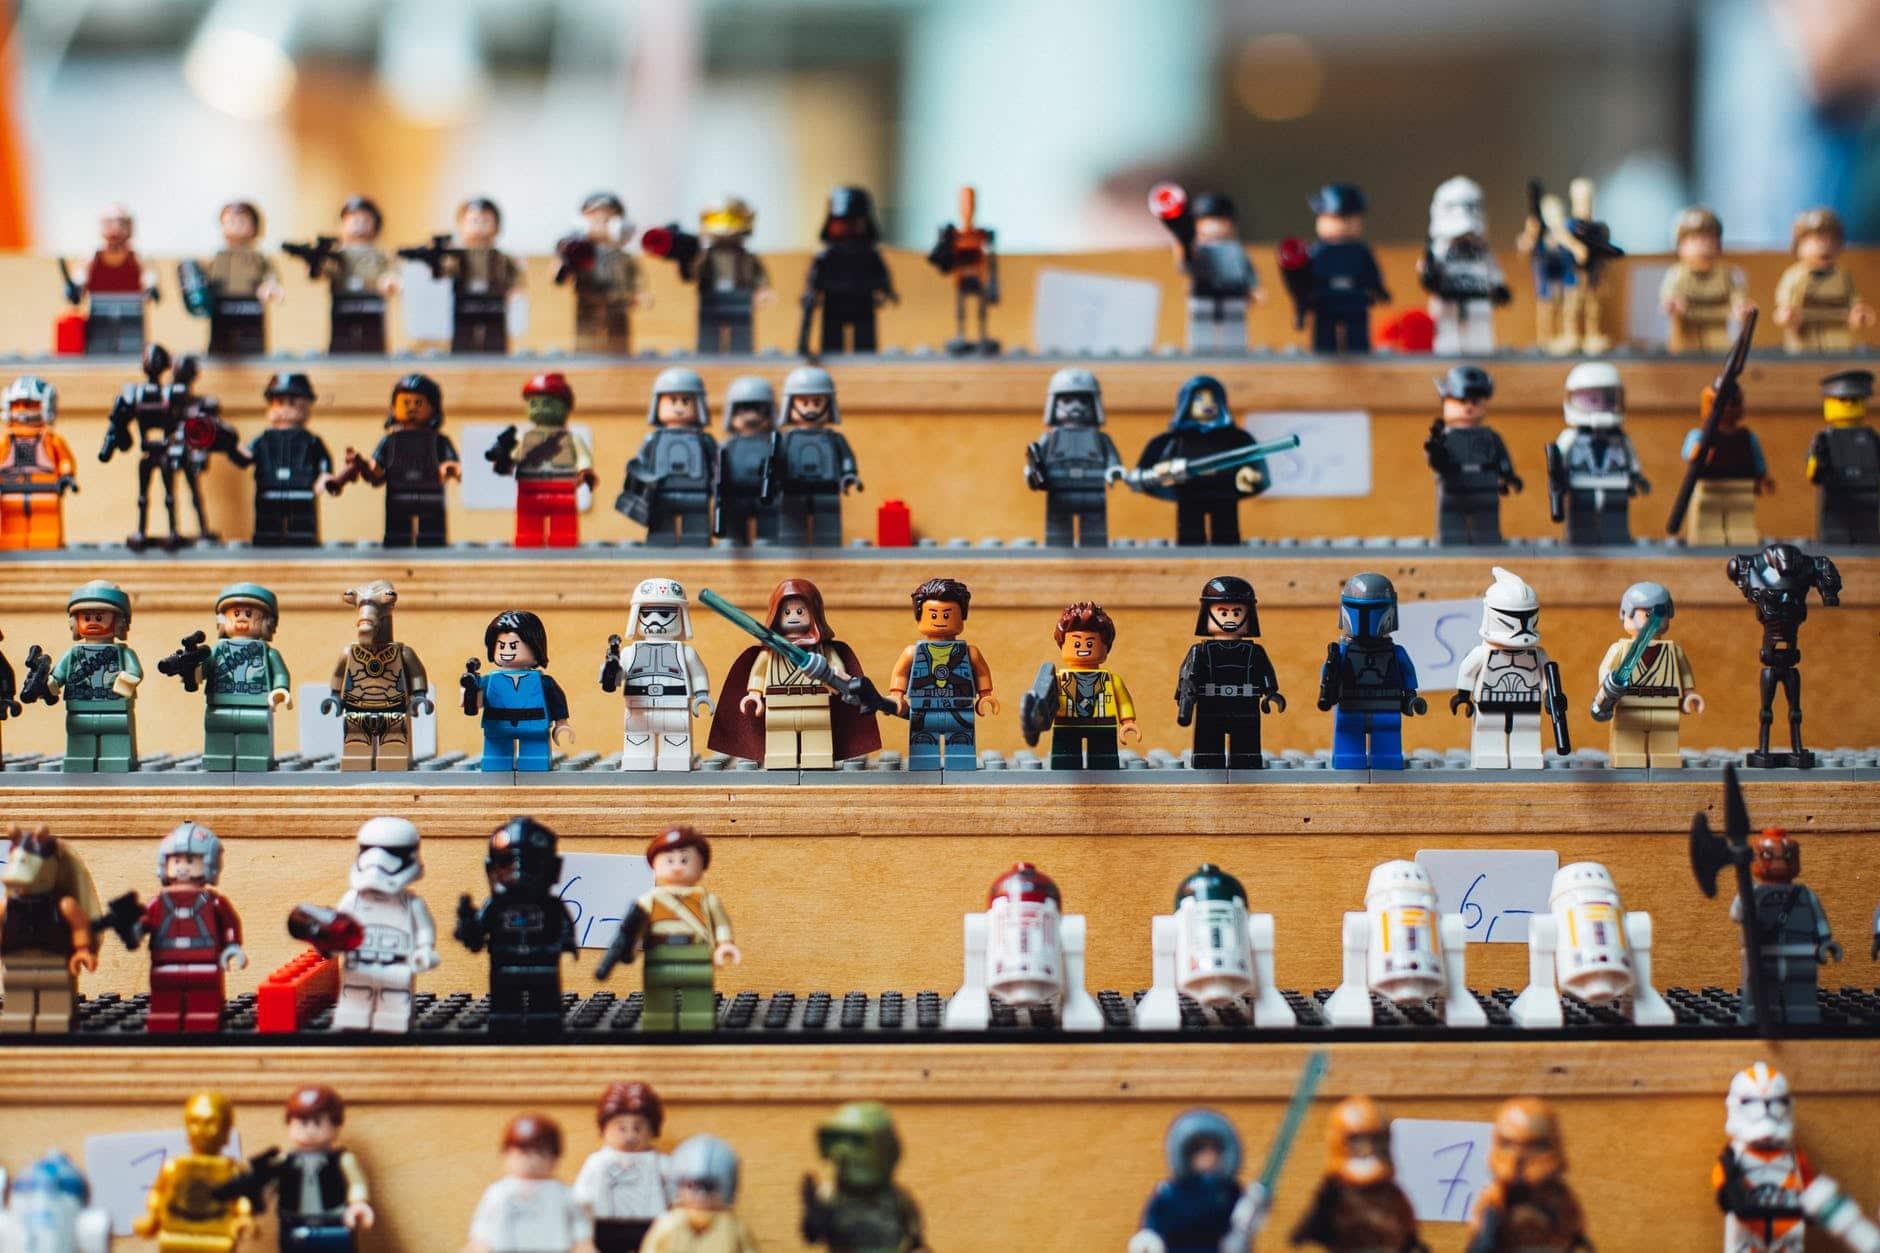 [Geekery Toy Box] Star Wars Goodies!